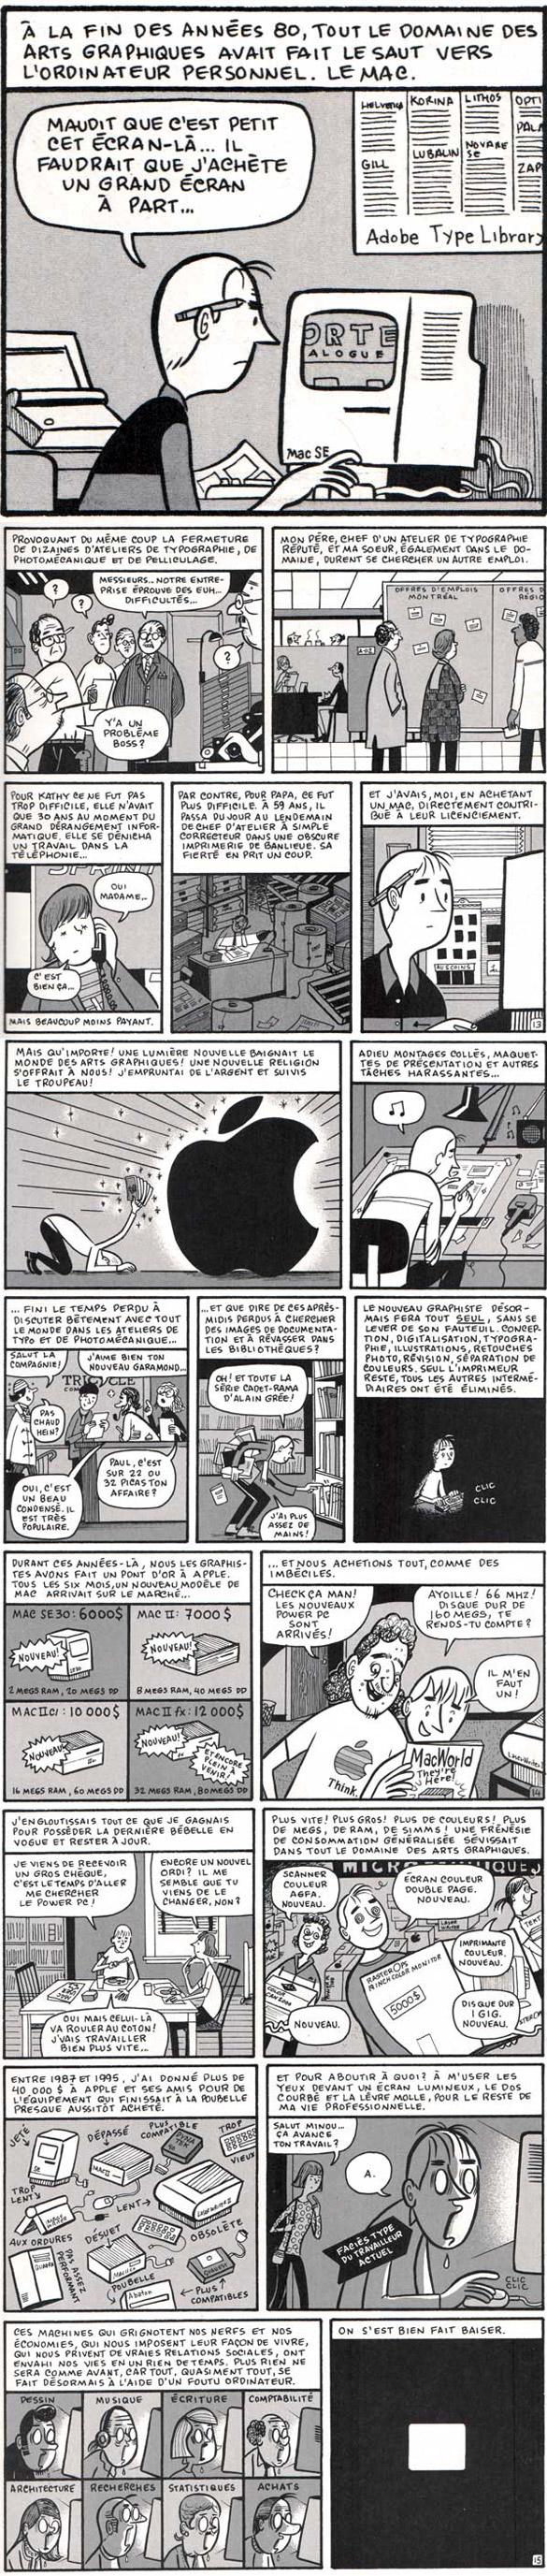 mac apple Apple et Paul : On sest bien fait baiser